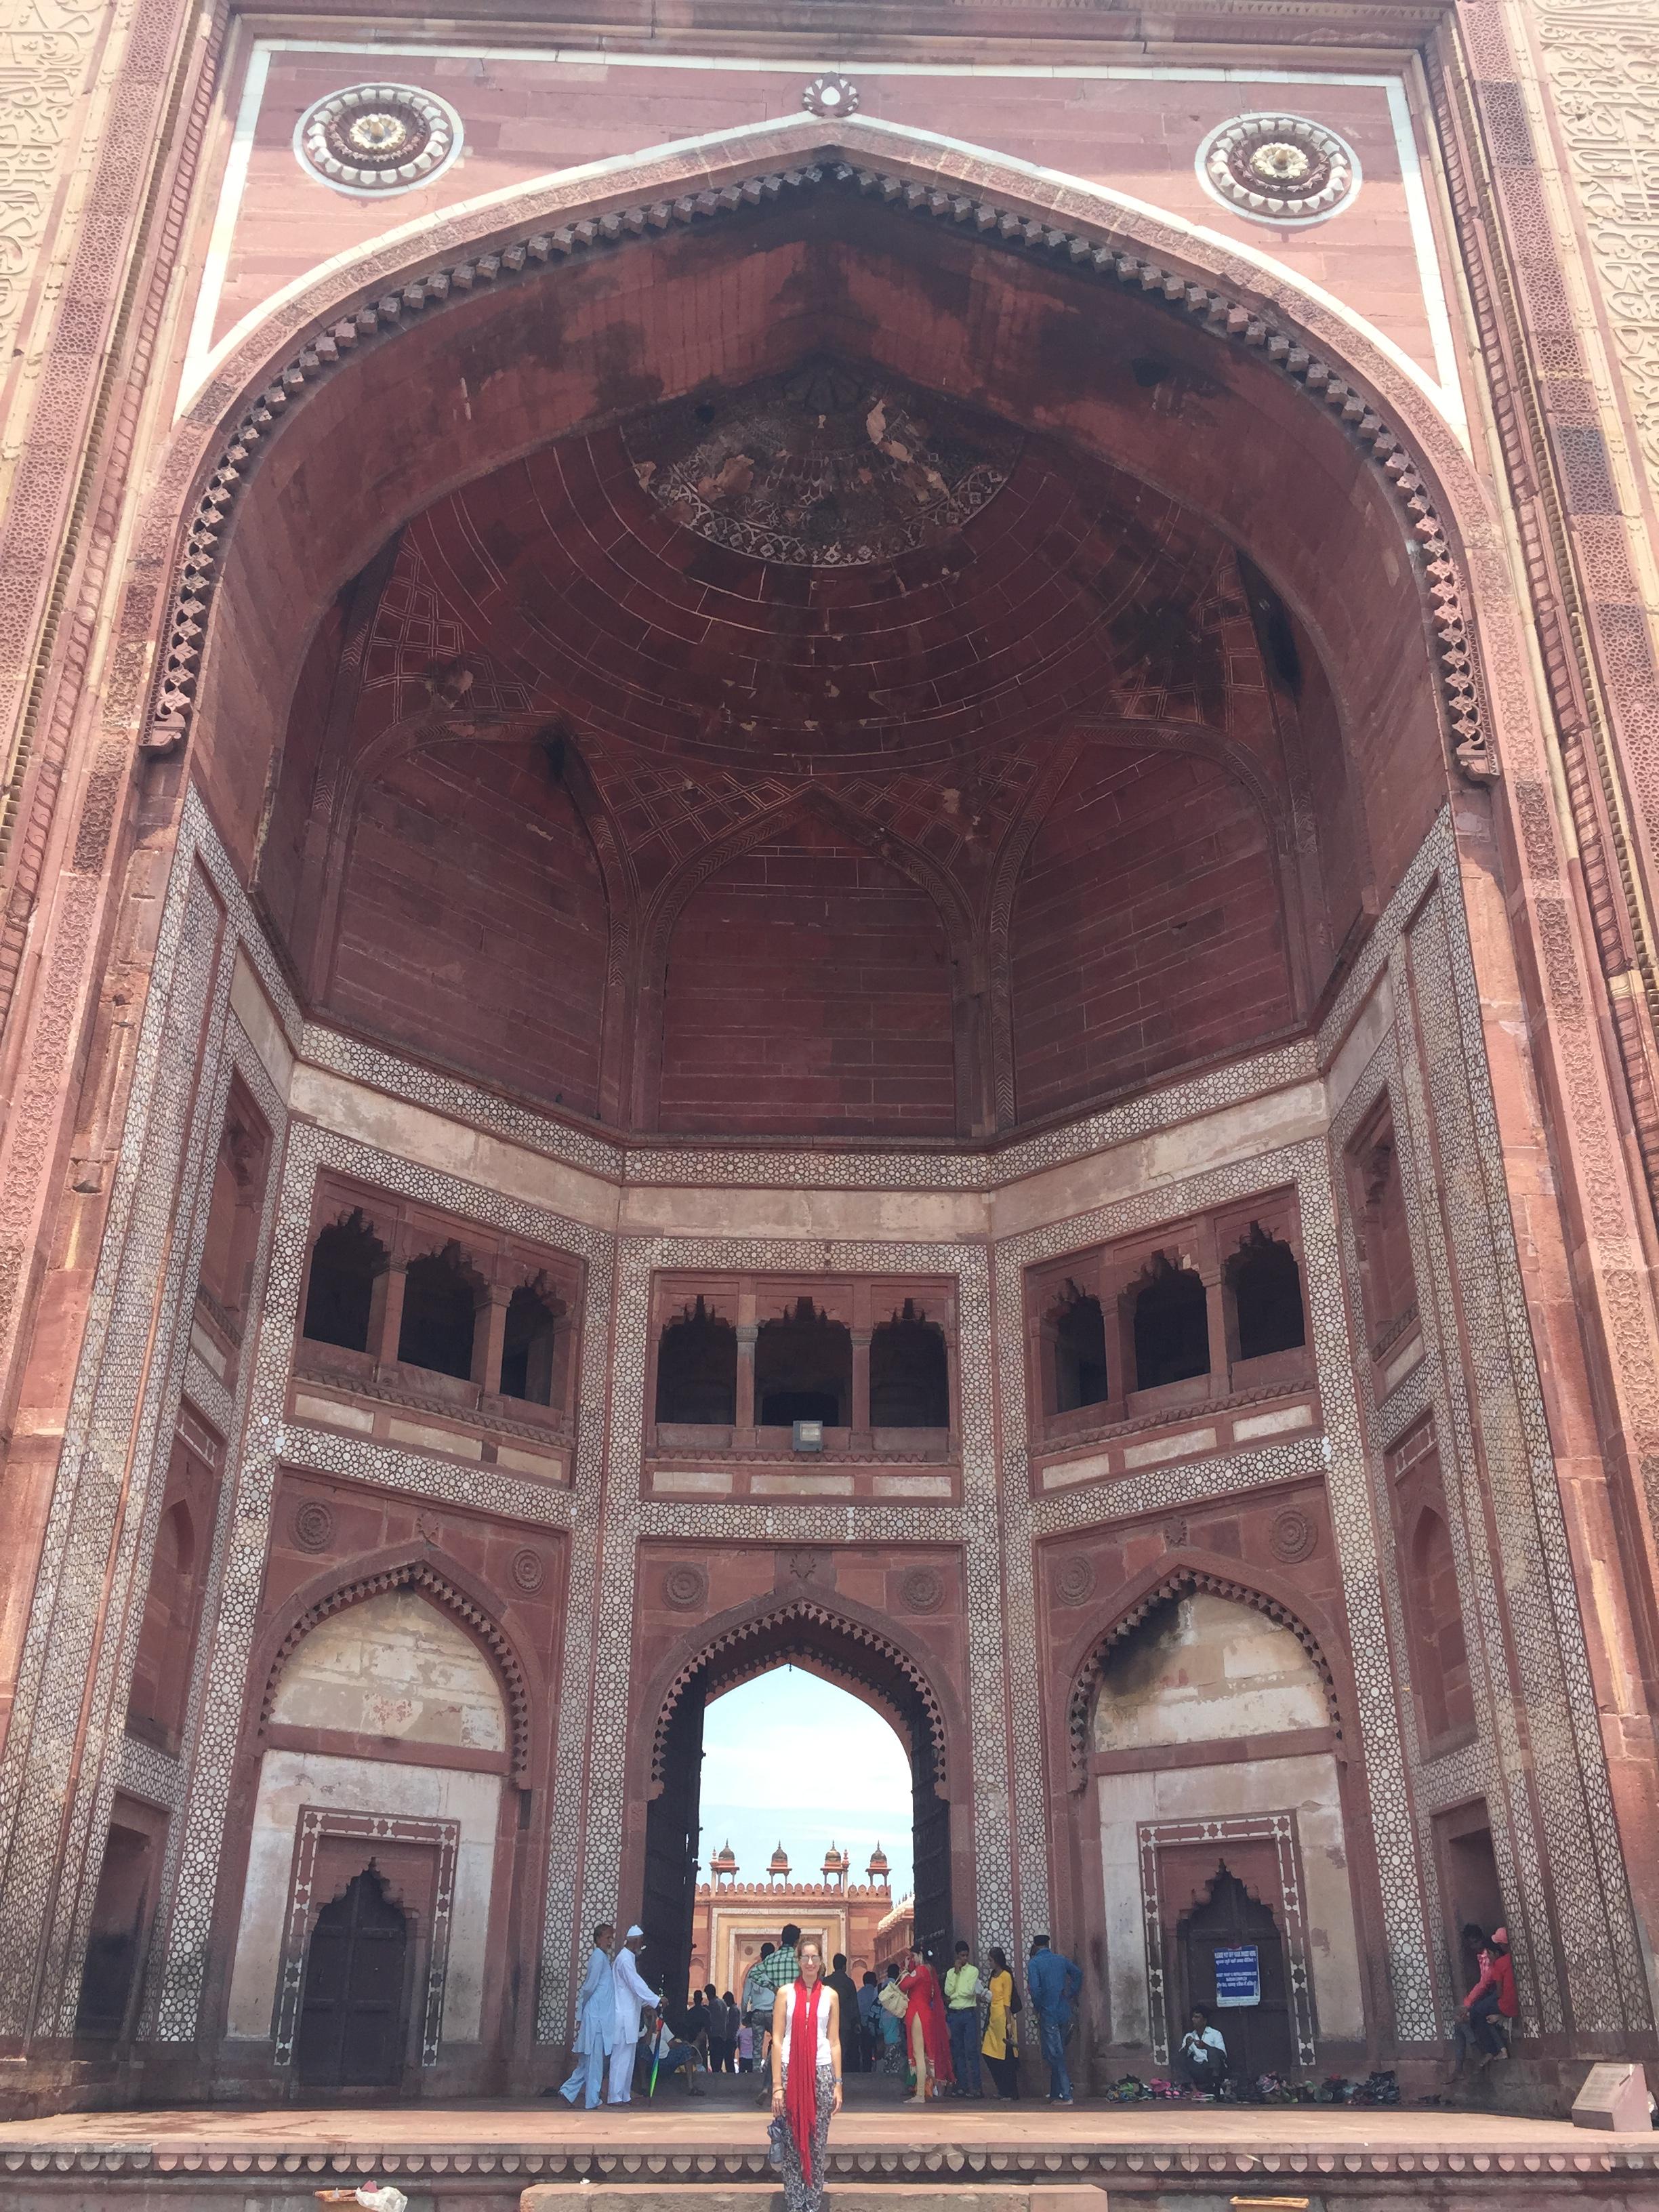 Buland Darwaza at Jama Masjid